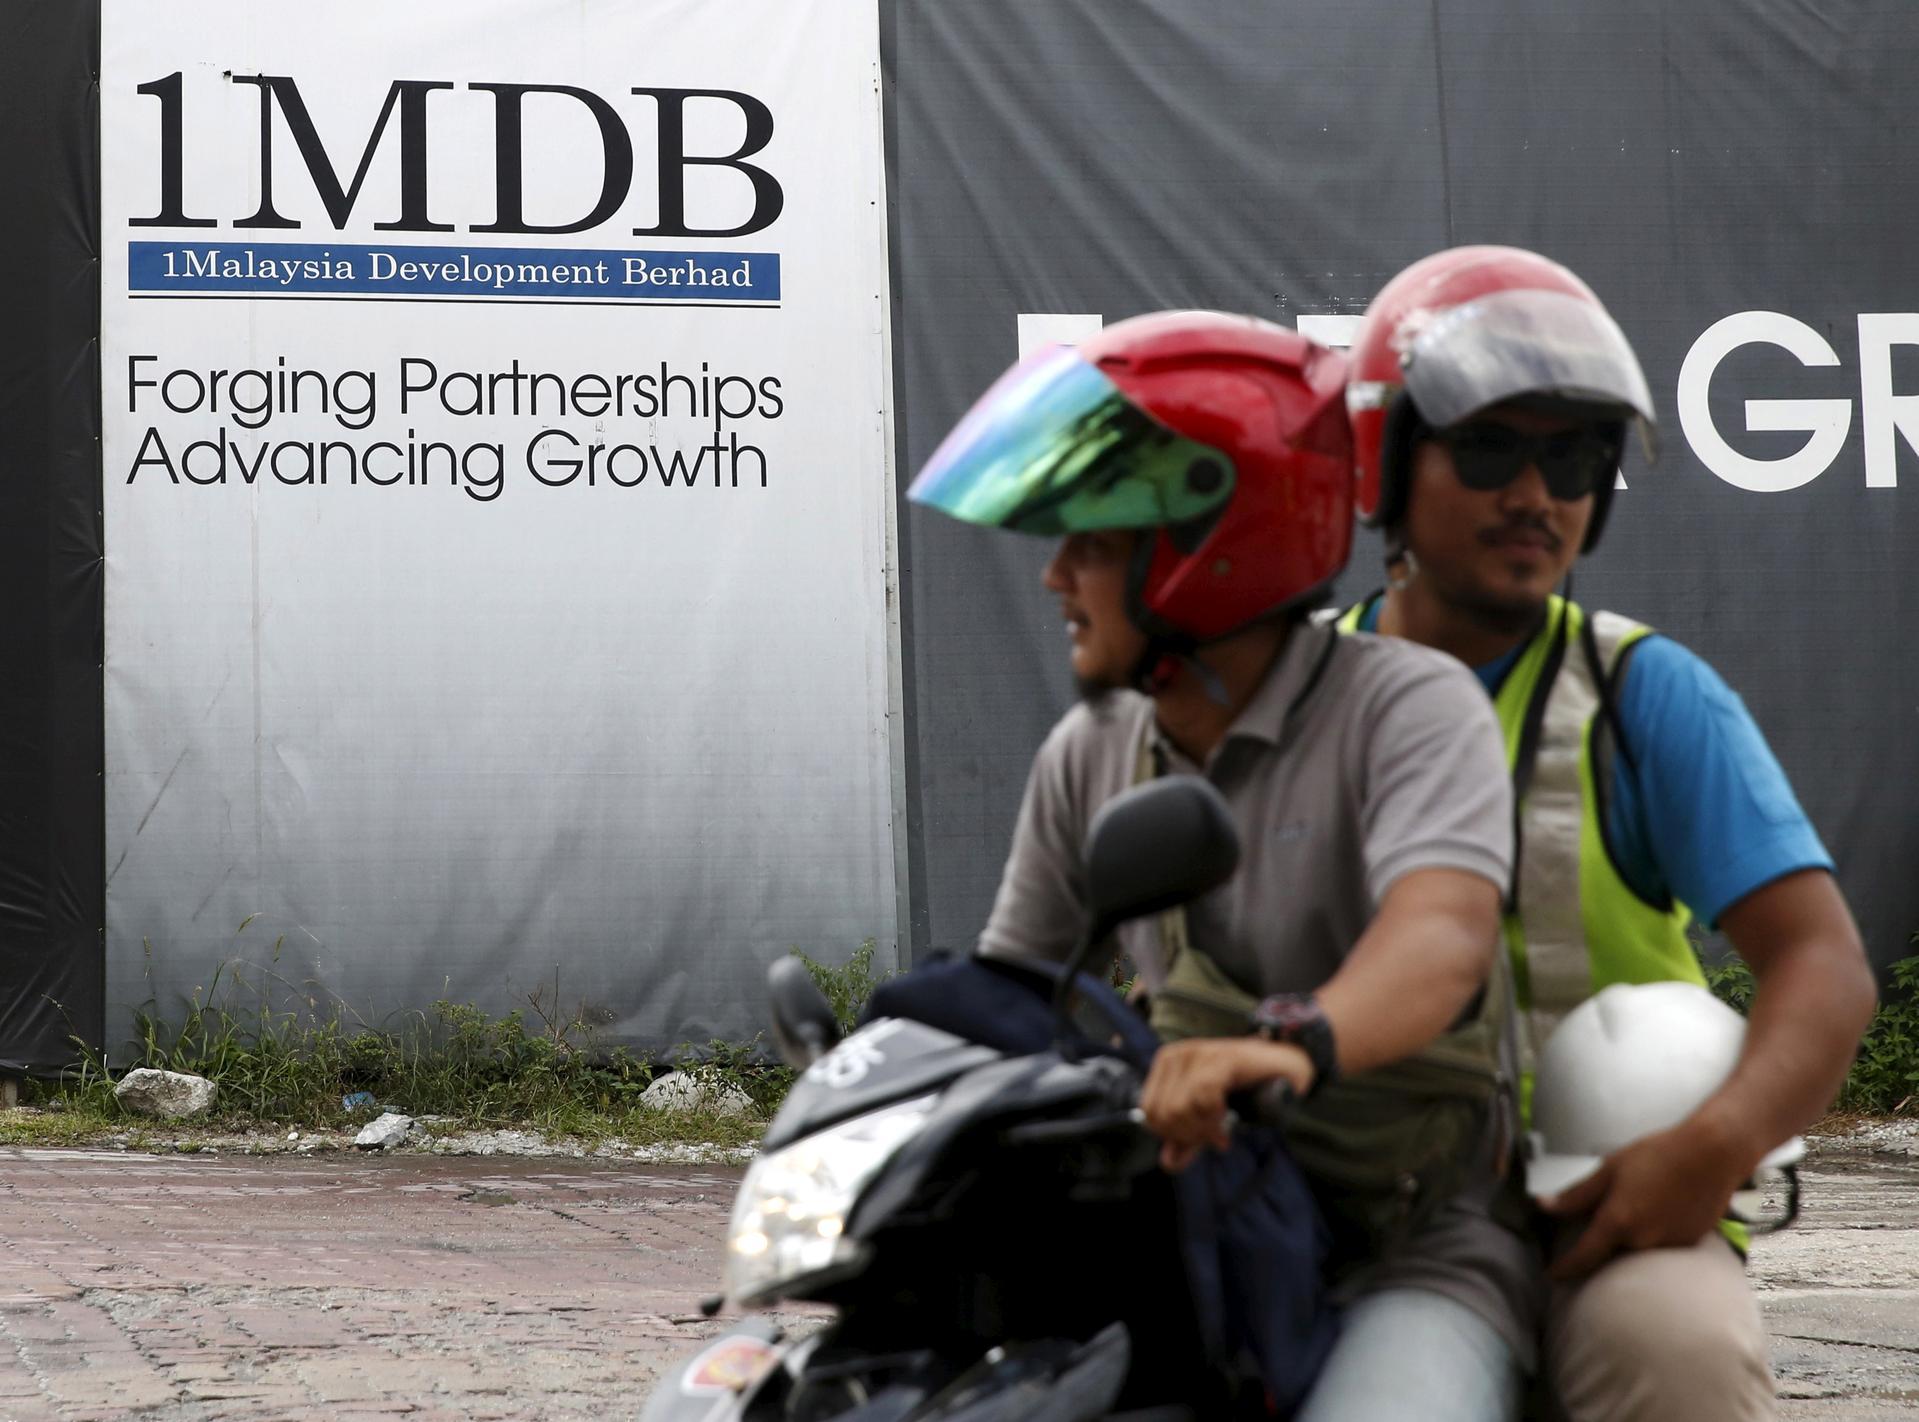 U.S. begins return of $200 million in 1MDB funds to Malaysia